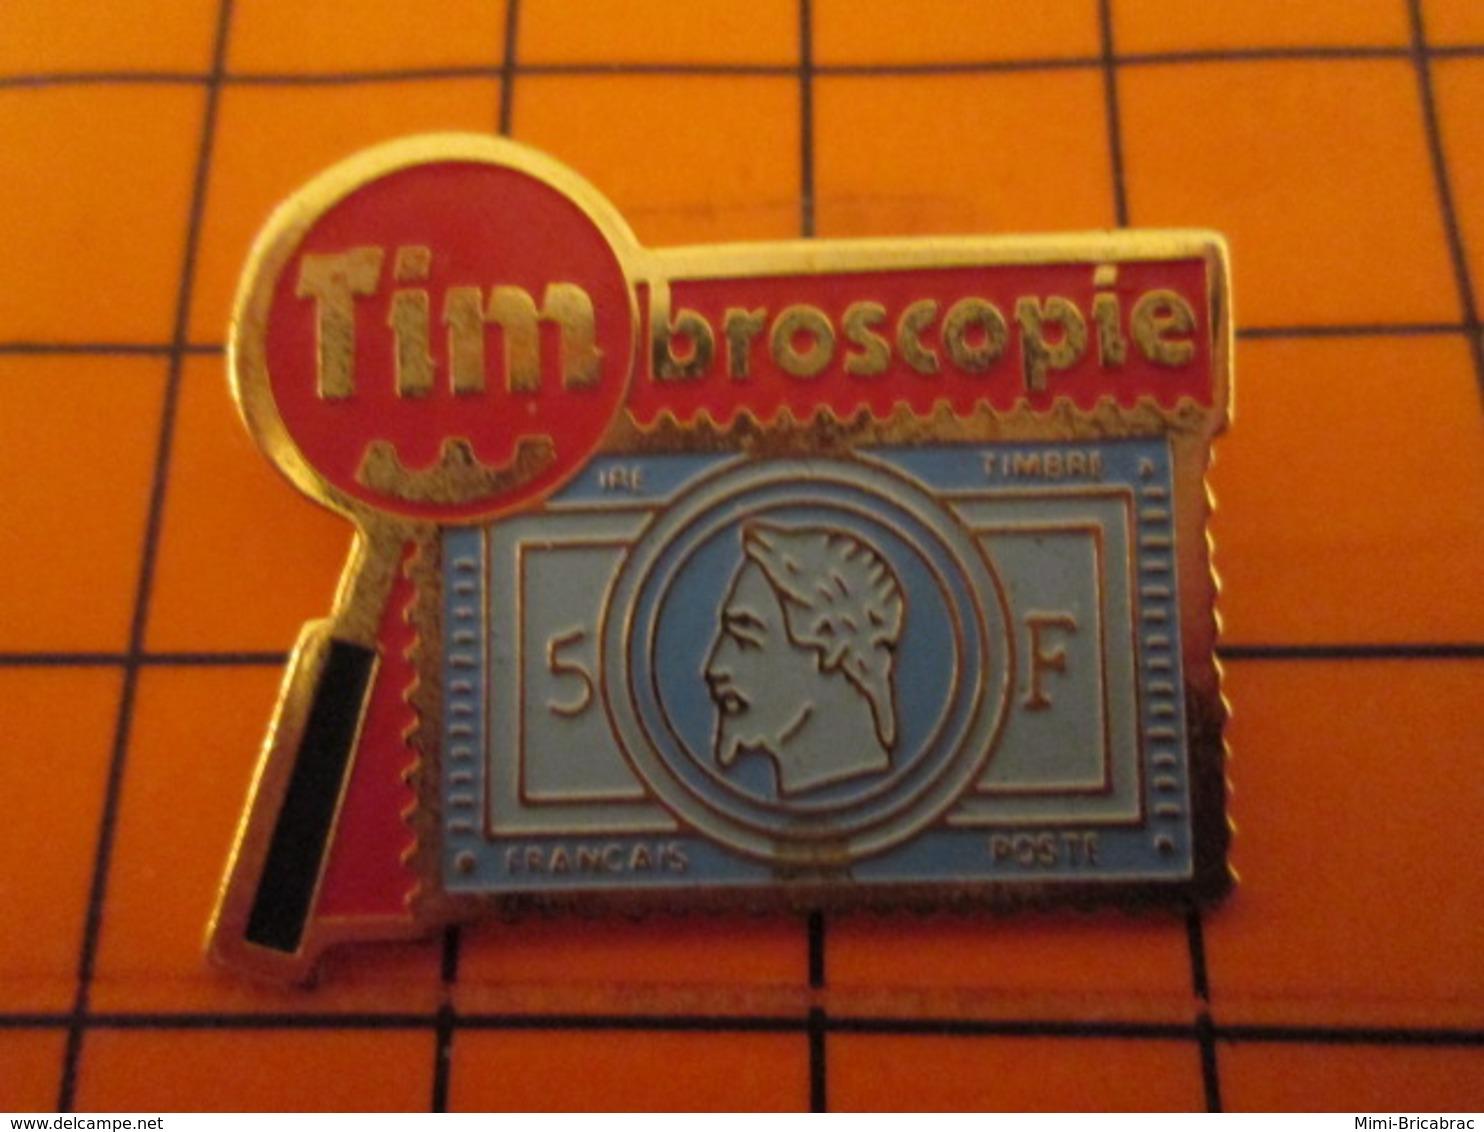 0220 Pin's Pins / Beau Et Rare : Thème POSTES / LA POSTE TIMBROSCOPIE TIMBRE-POSTE NAPOLEON III - Mail Services